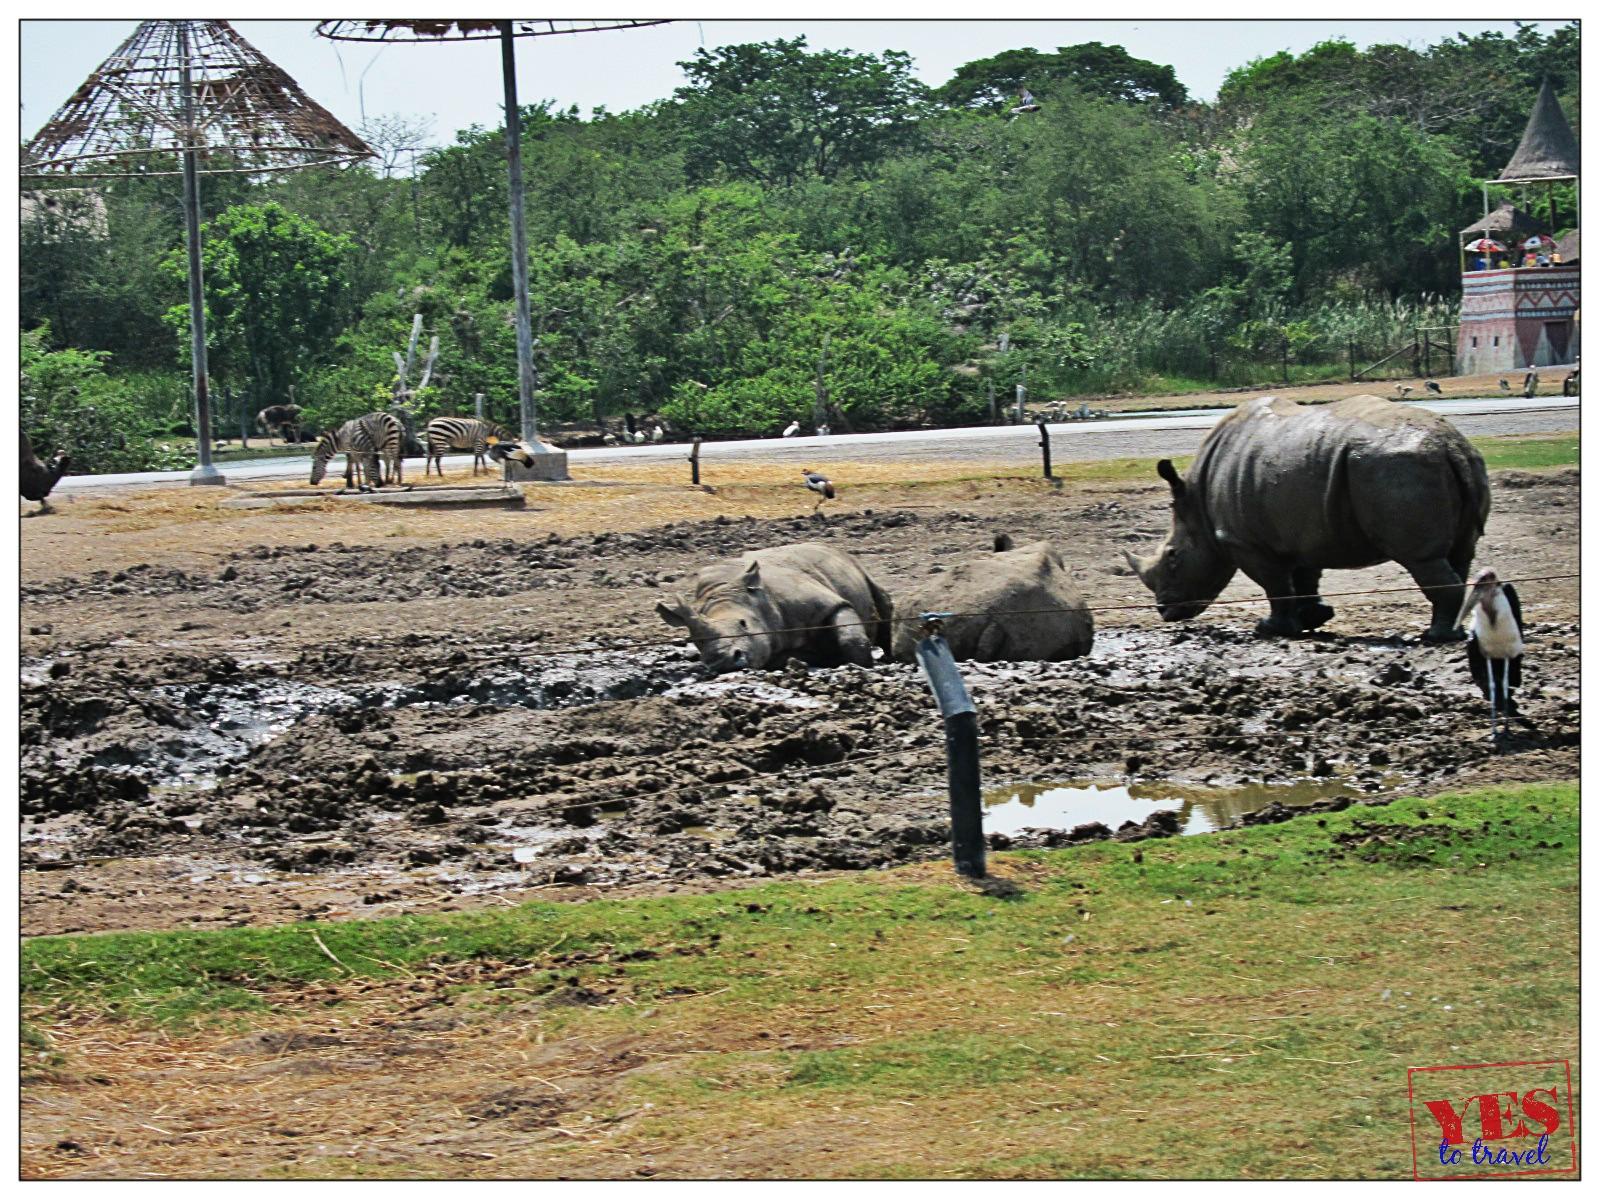 Safari World Bangkok: Safari Park  Yes to Travel